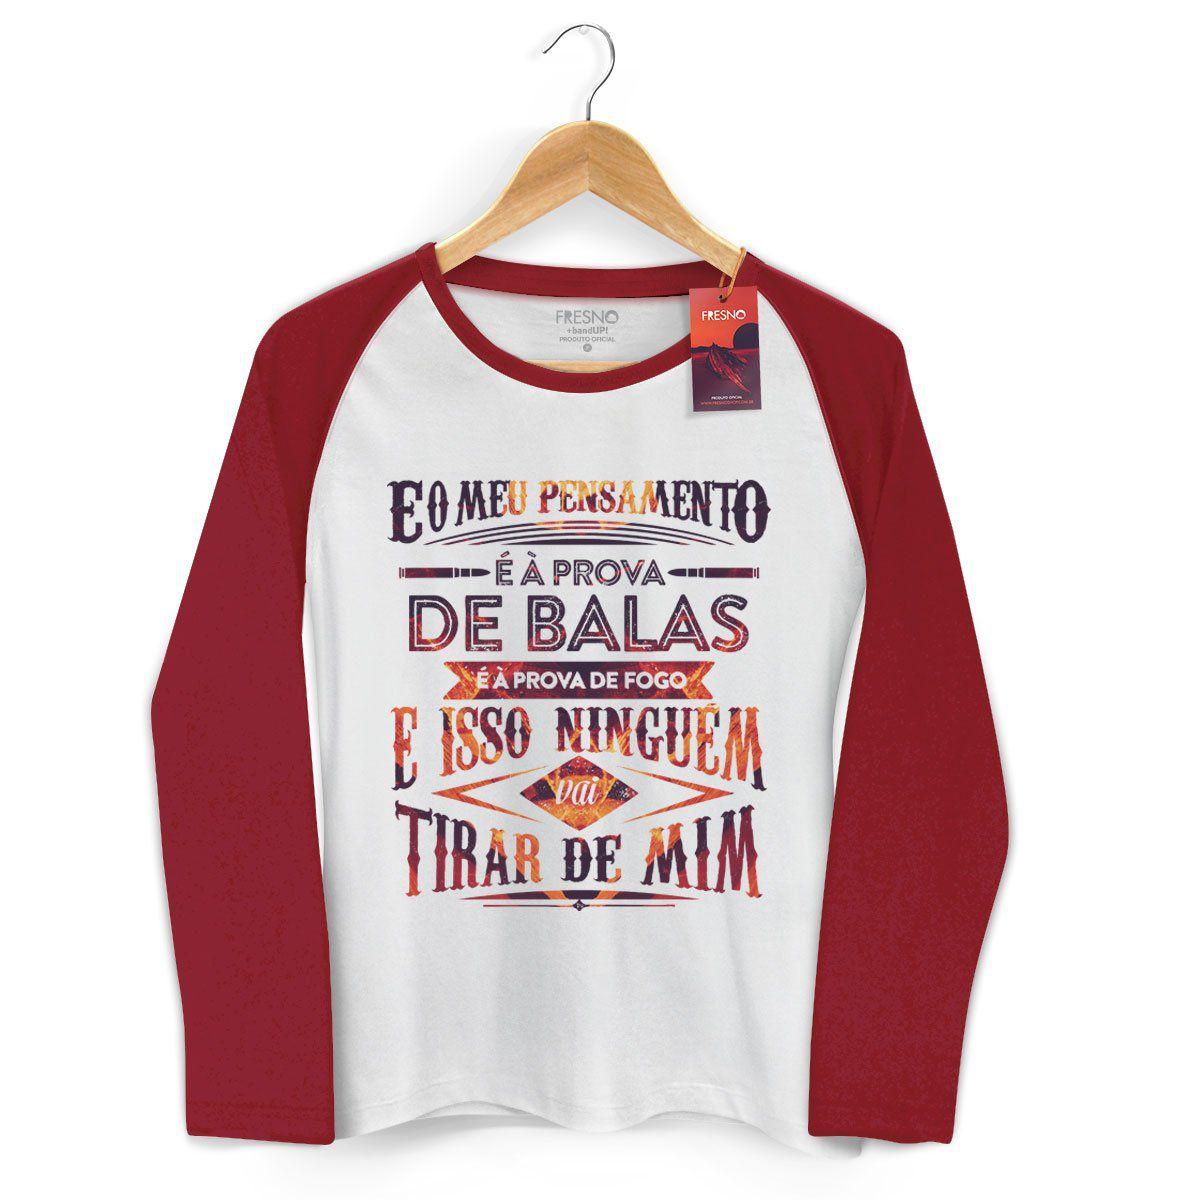 Camiseta Manga Longa Raglan Feminina Fresno Pensamento à Prova de Balas Type 2